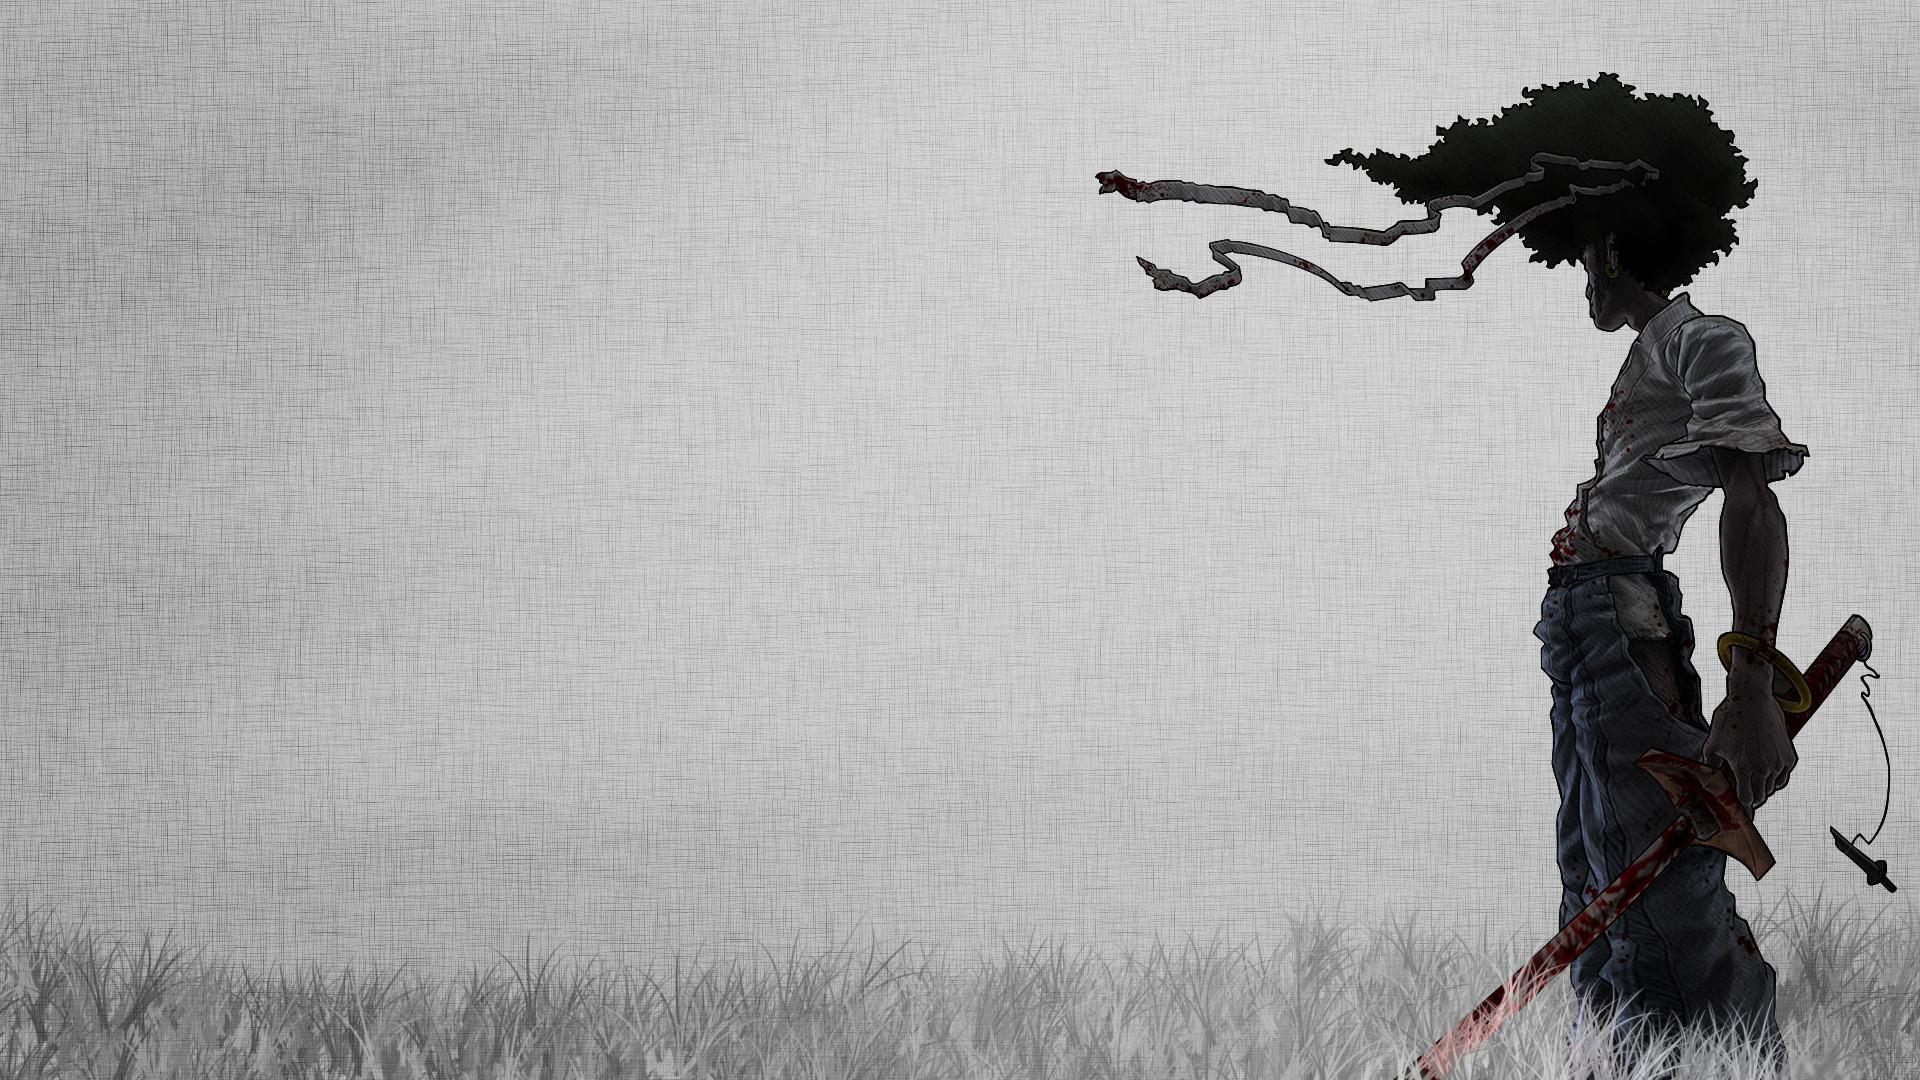 Afro Samurai 1920x1080 Wallpaper by BlackLotusXX